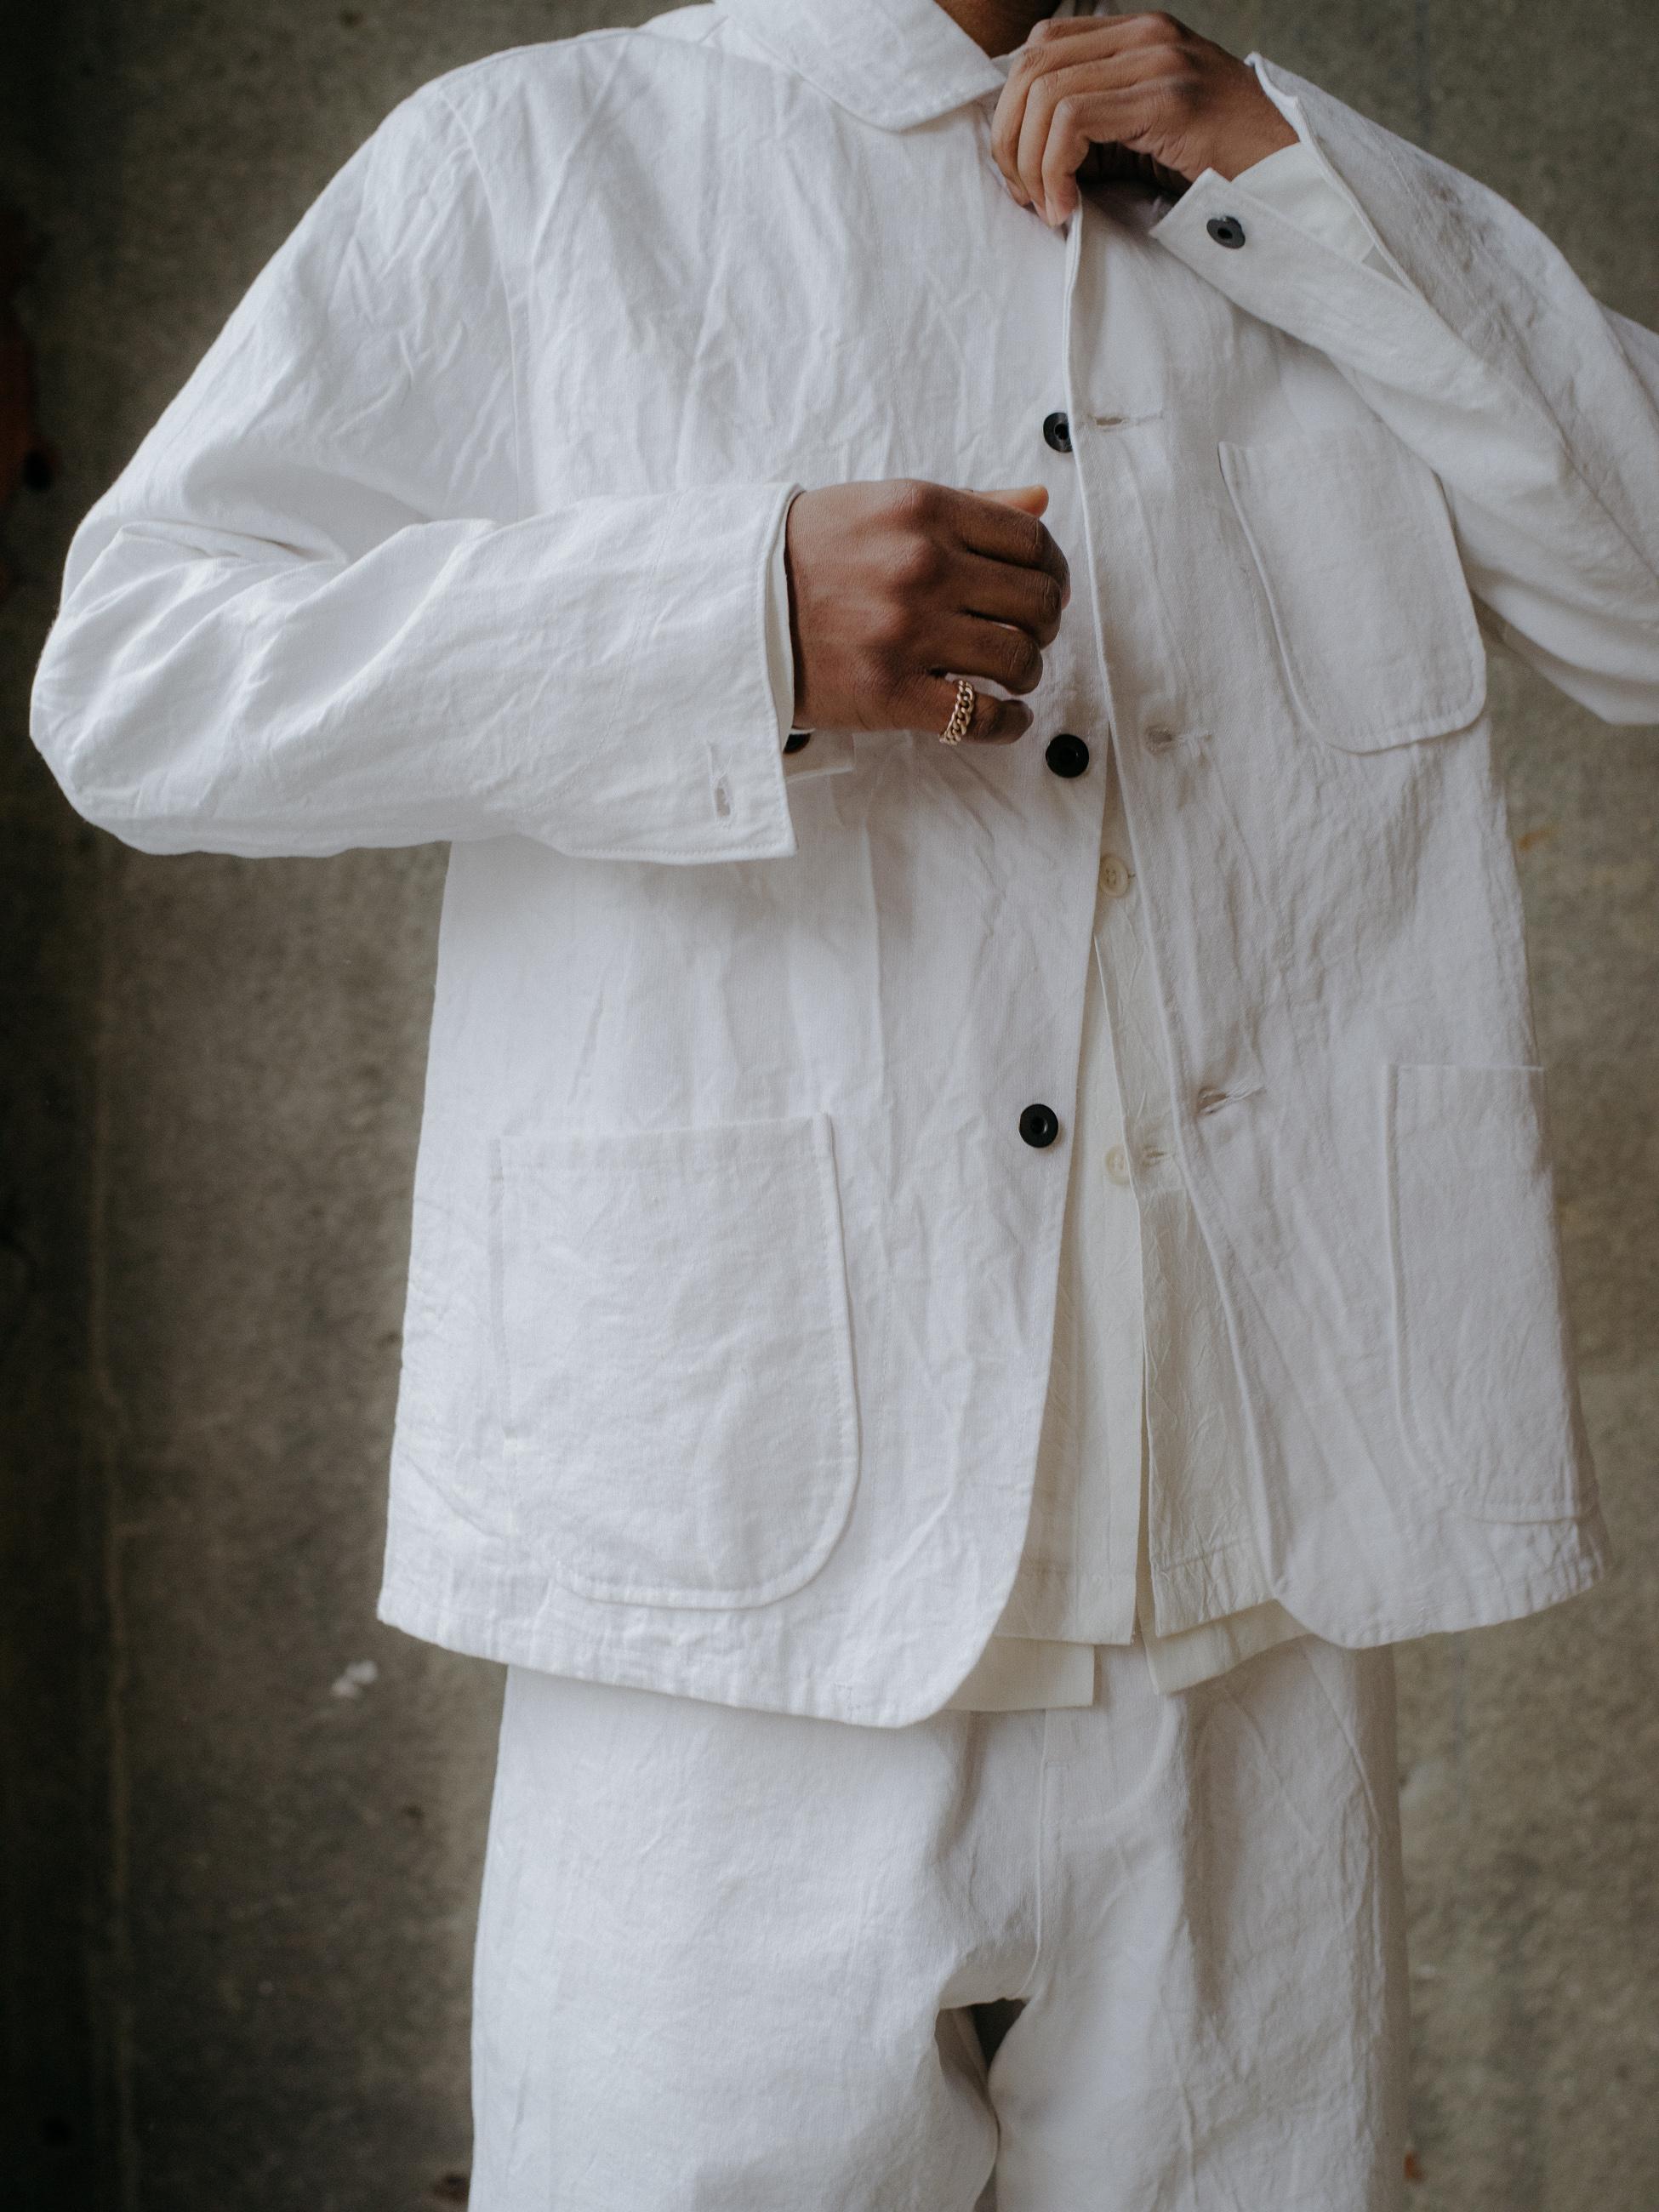 evan-kinori-three-pocket-jacket-tumbled-hemp-cotton-italy-7